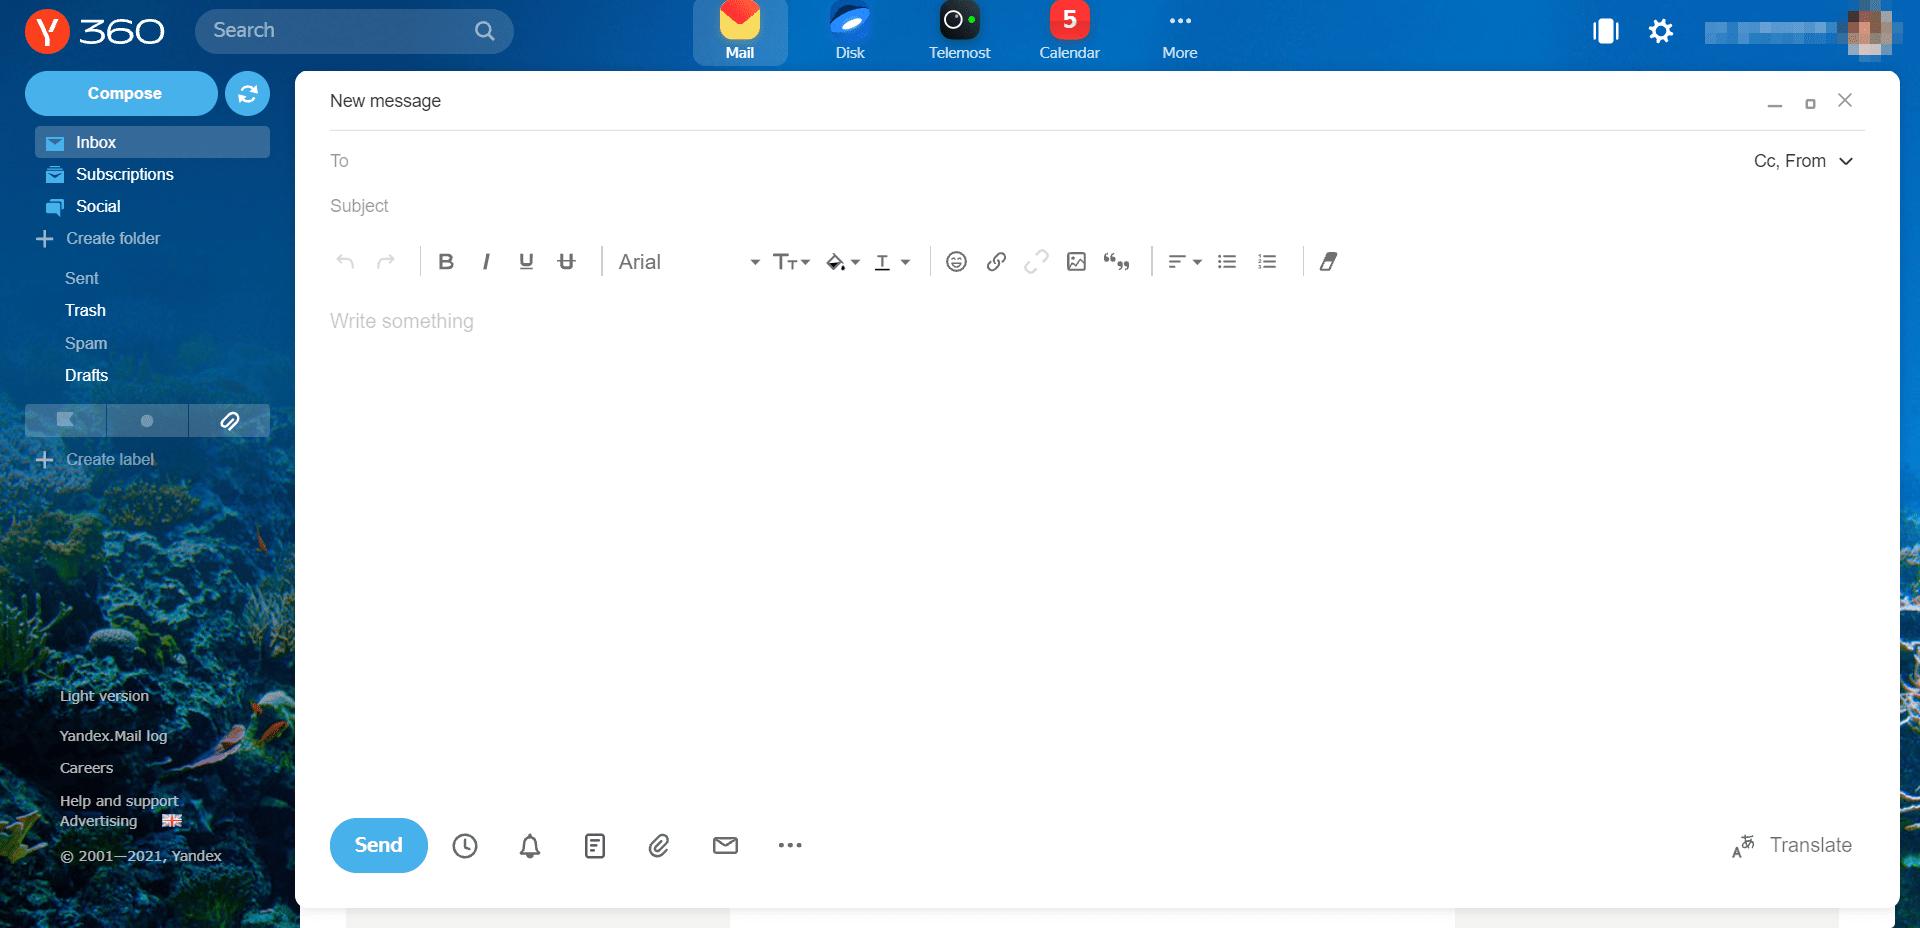 Yandex Mail inbox